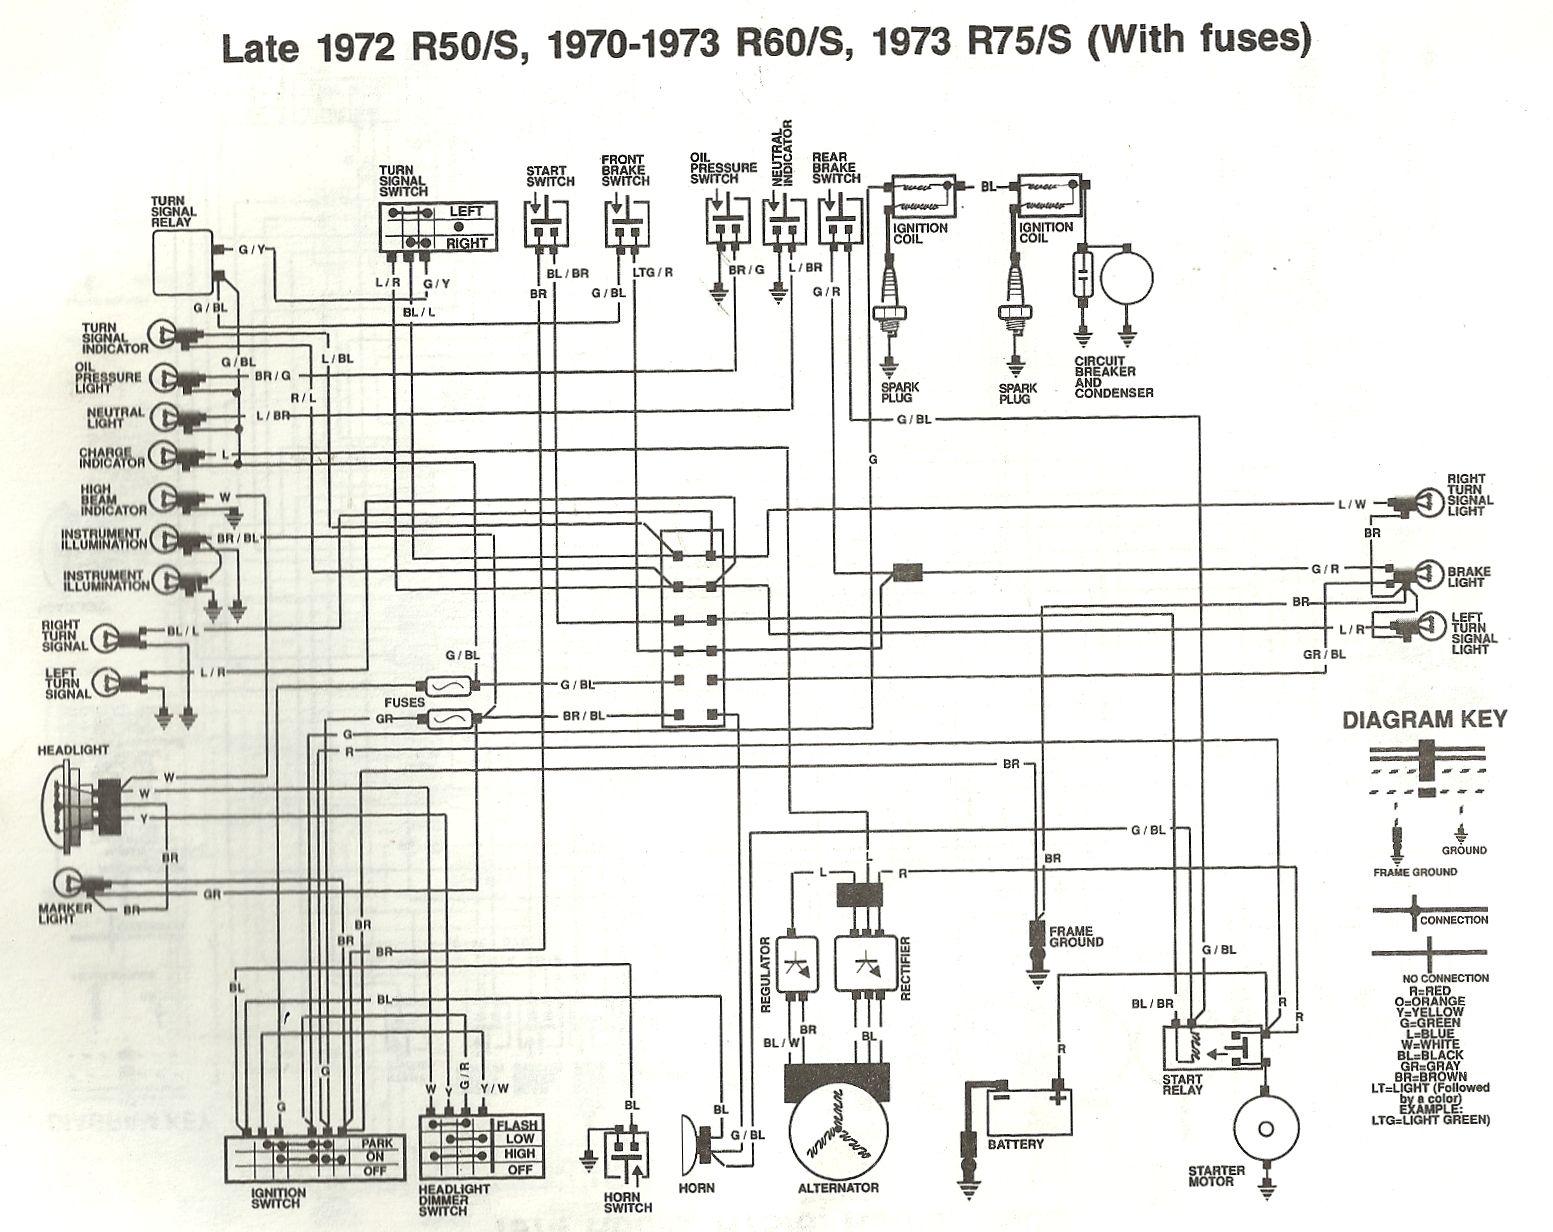 hight resolution of bmw r60 5 wiring diagram wiring diagrams 24bmw r60 5 wiring diagram bmw r60 2 wiring